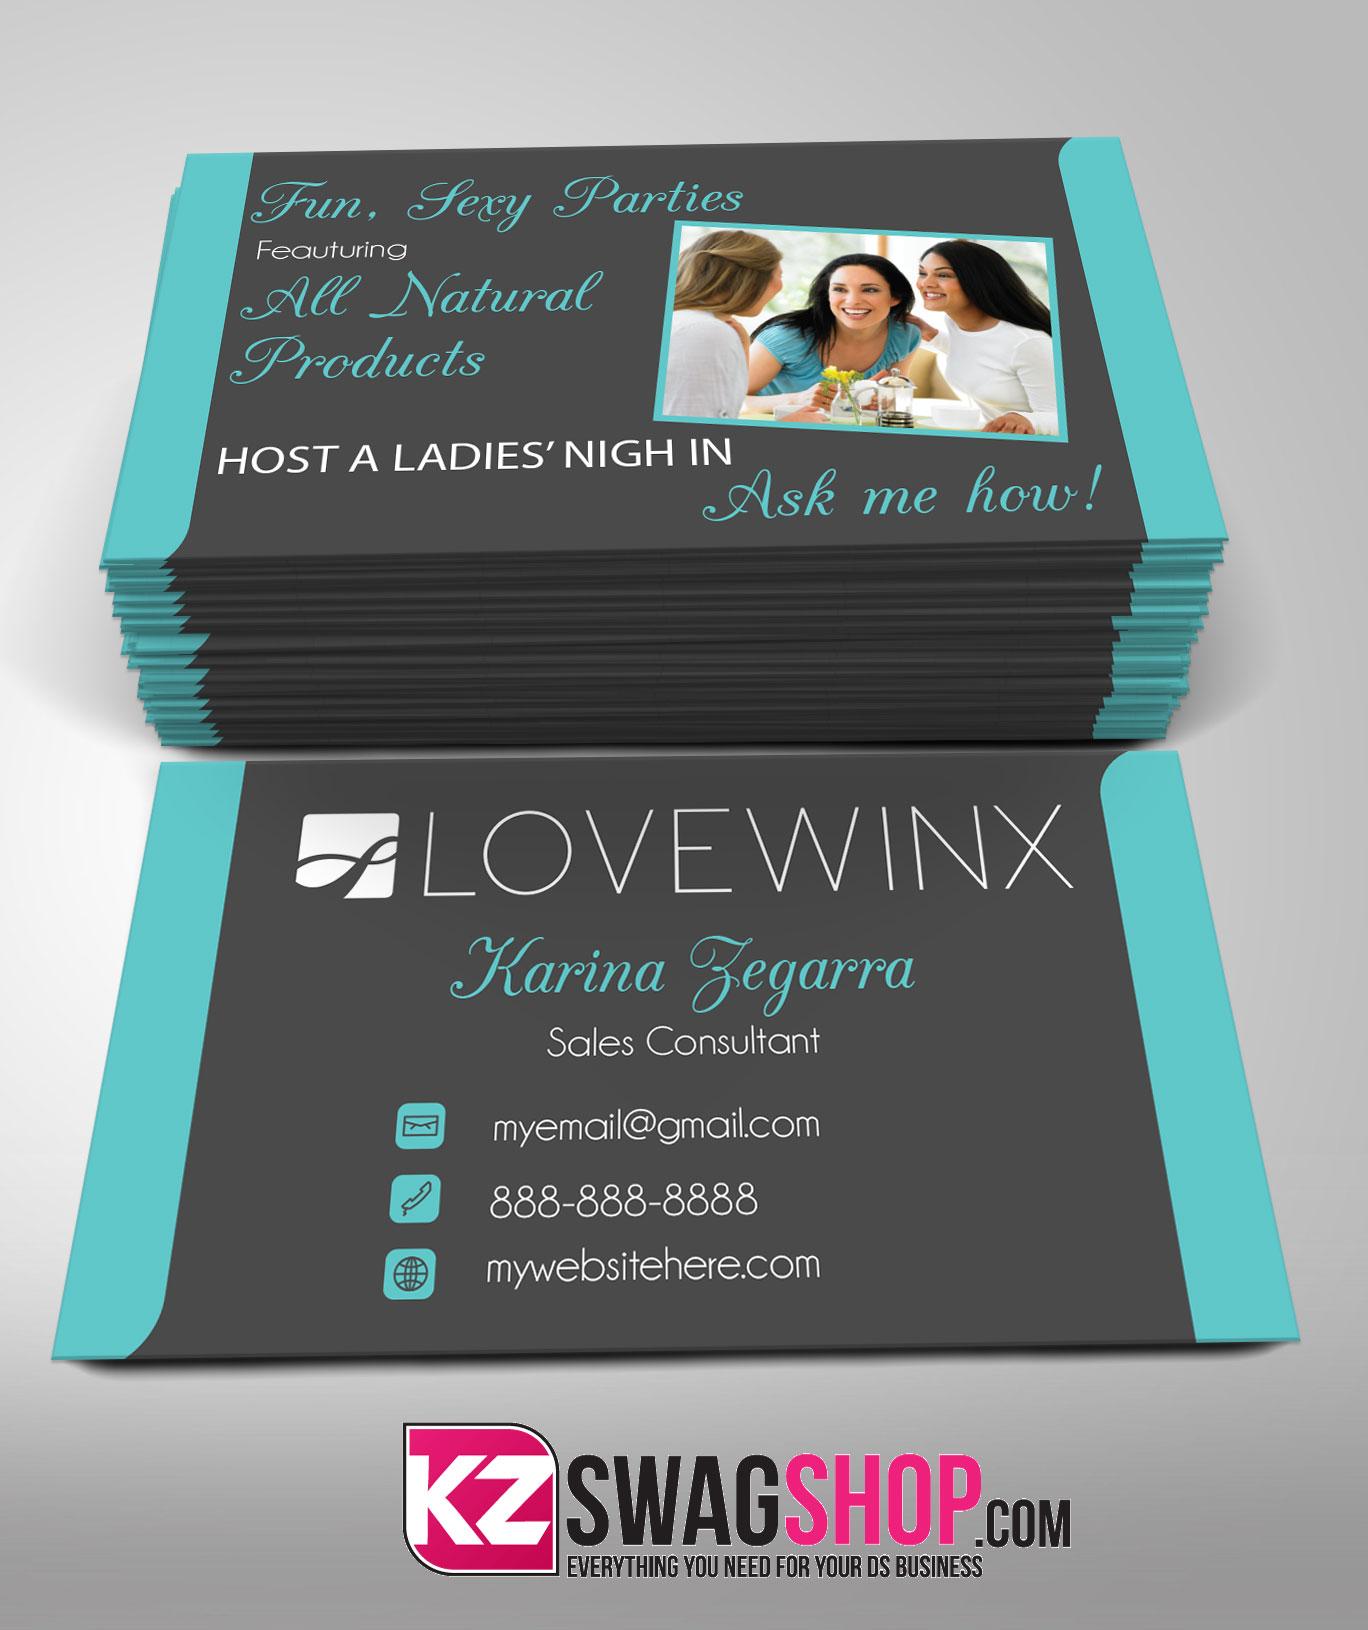 Lovewinx business card 2 kz creative services online store lovewinx business card 2 colourmoves